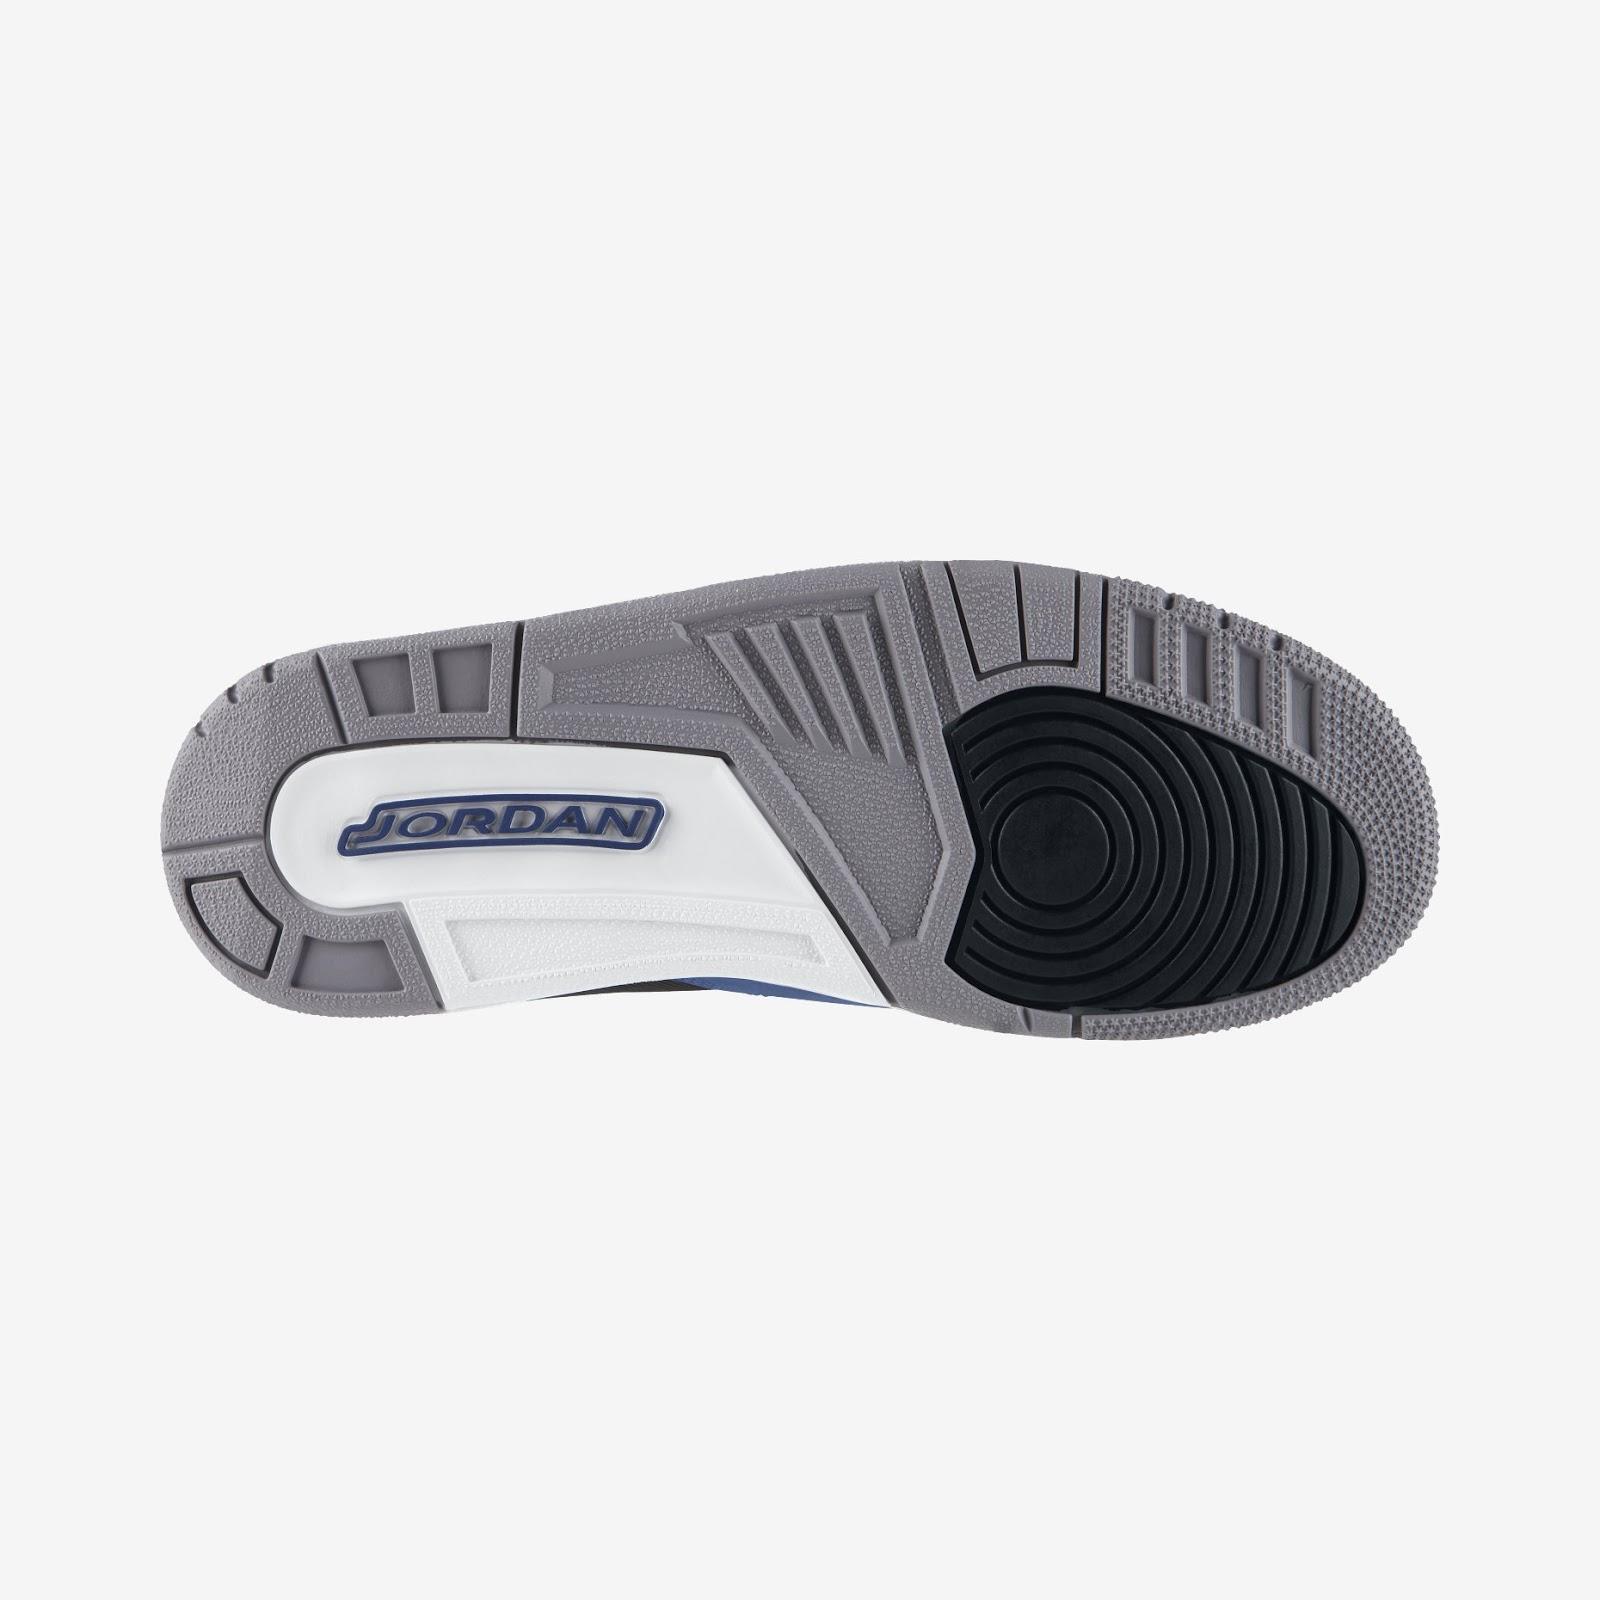 a092ef763ba3 Nike Air Jordan Retro Basketball Shoes and Sandals!  JORDAN FLIGHT ...